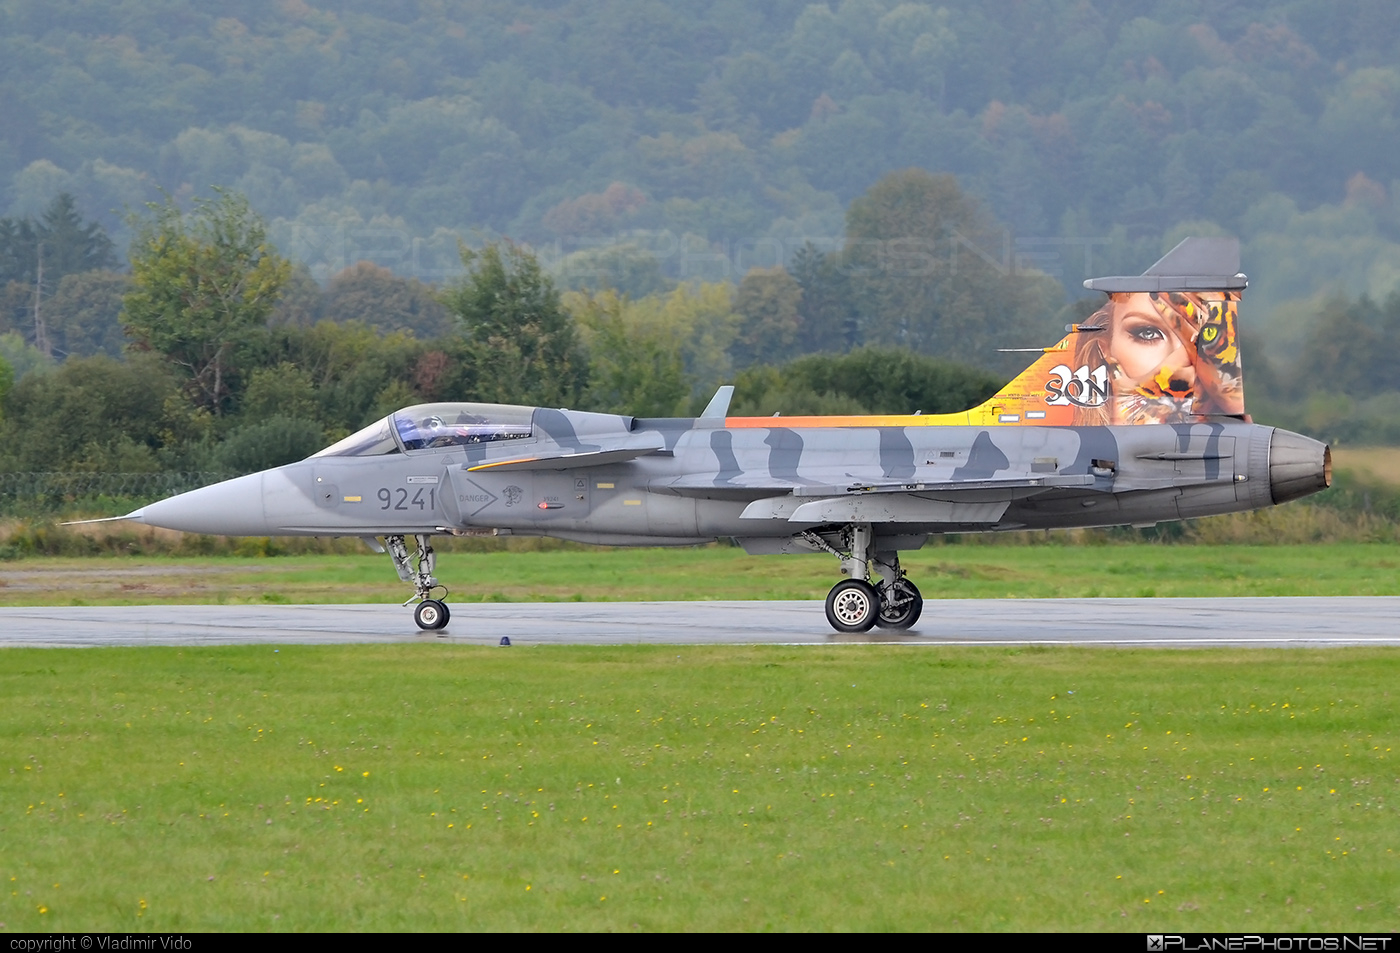 Saab JAS 39C Gripen - 9241 operated by Vzdušné síly AČR (Czech Air Force) #czechairforce #gripen #jas39 #jas39c #jas39gripen #saab #siaf2018 #vzdusnesilyacr